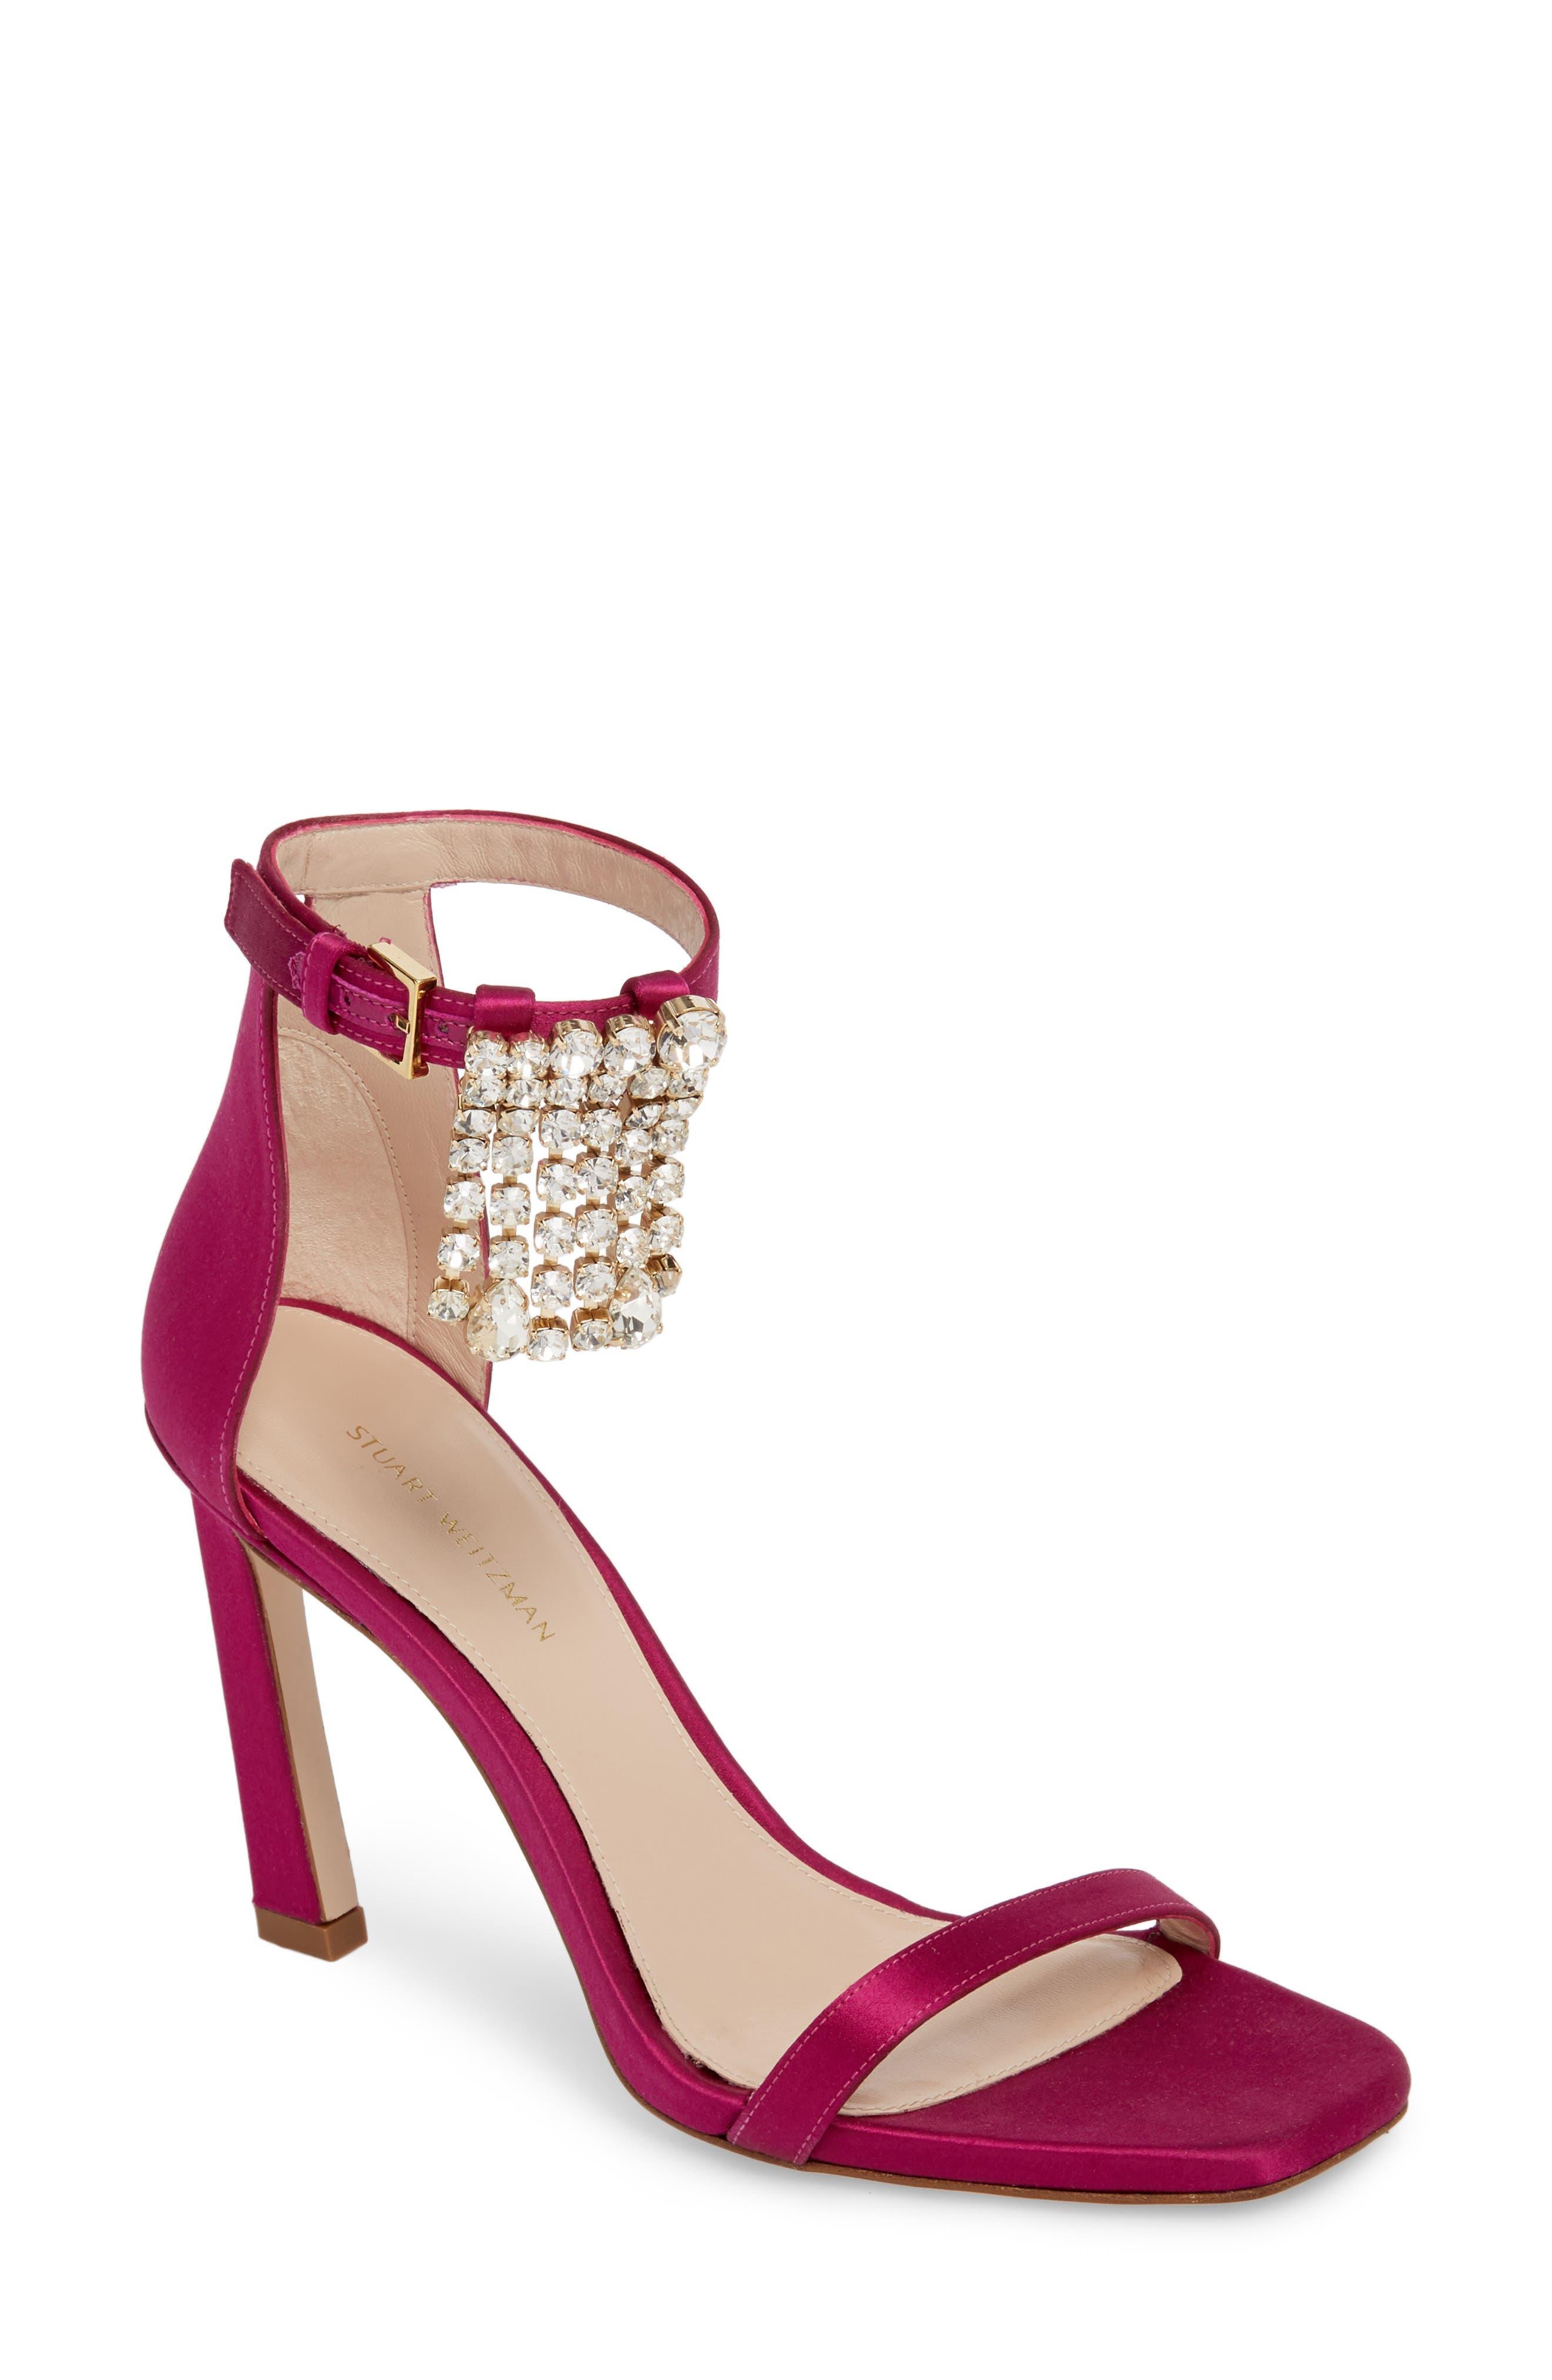 100FRINGESQUARENUDIST Sandal,                             Main thumbnail 1, color,                             Grape Silk Satin